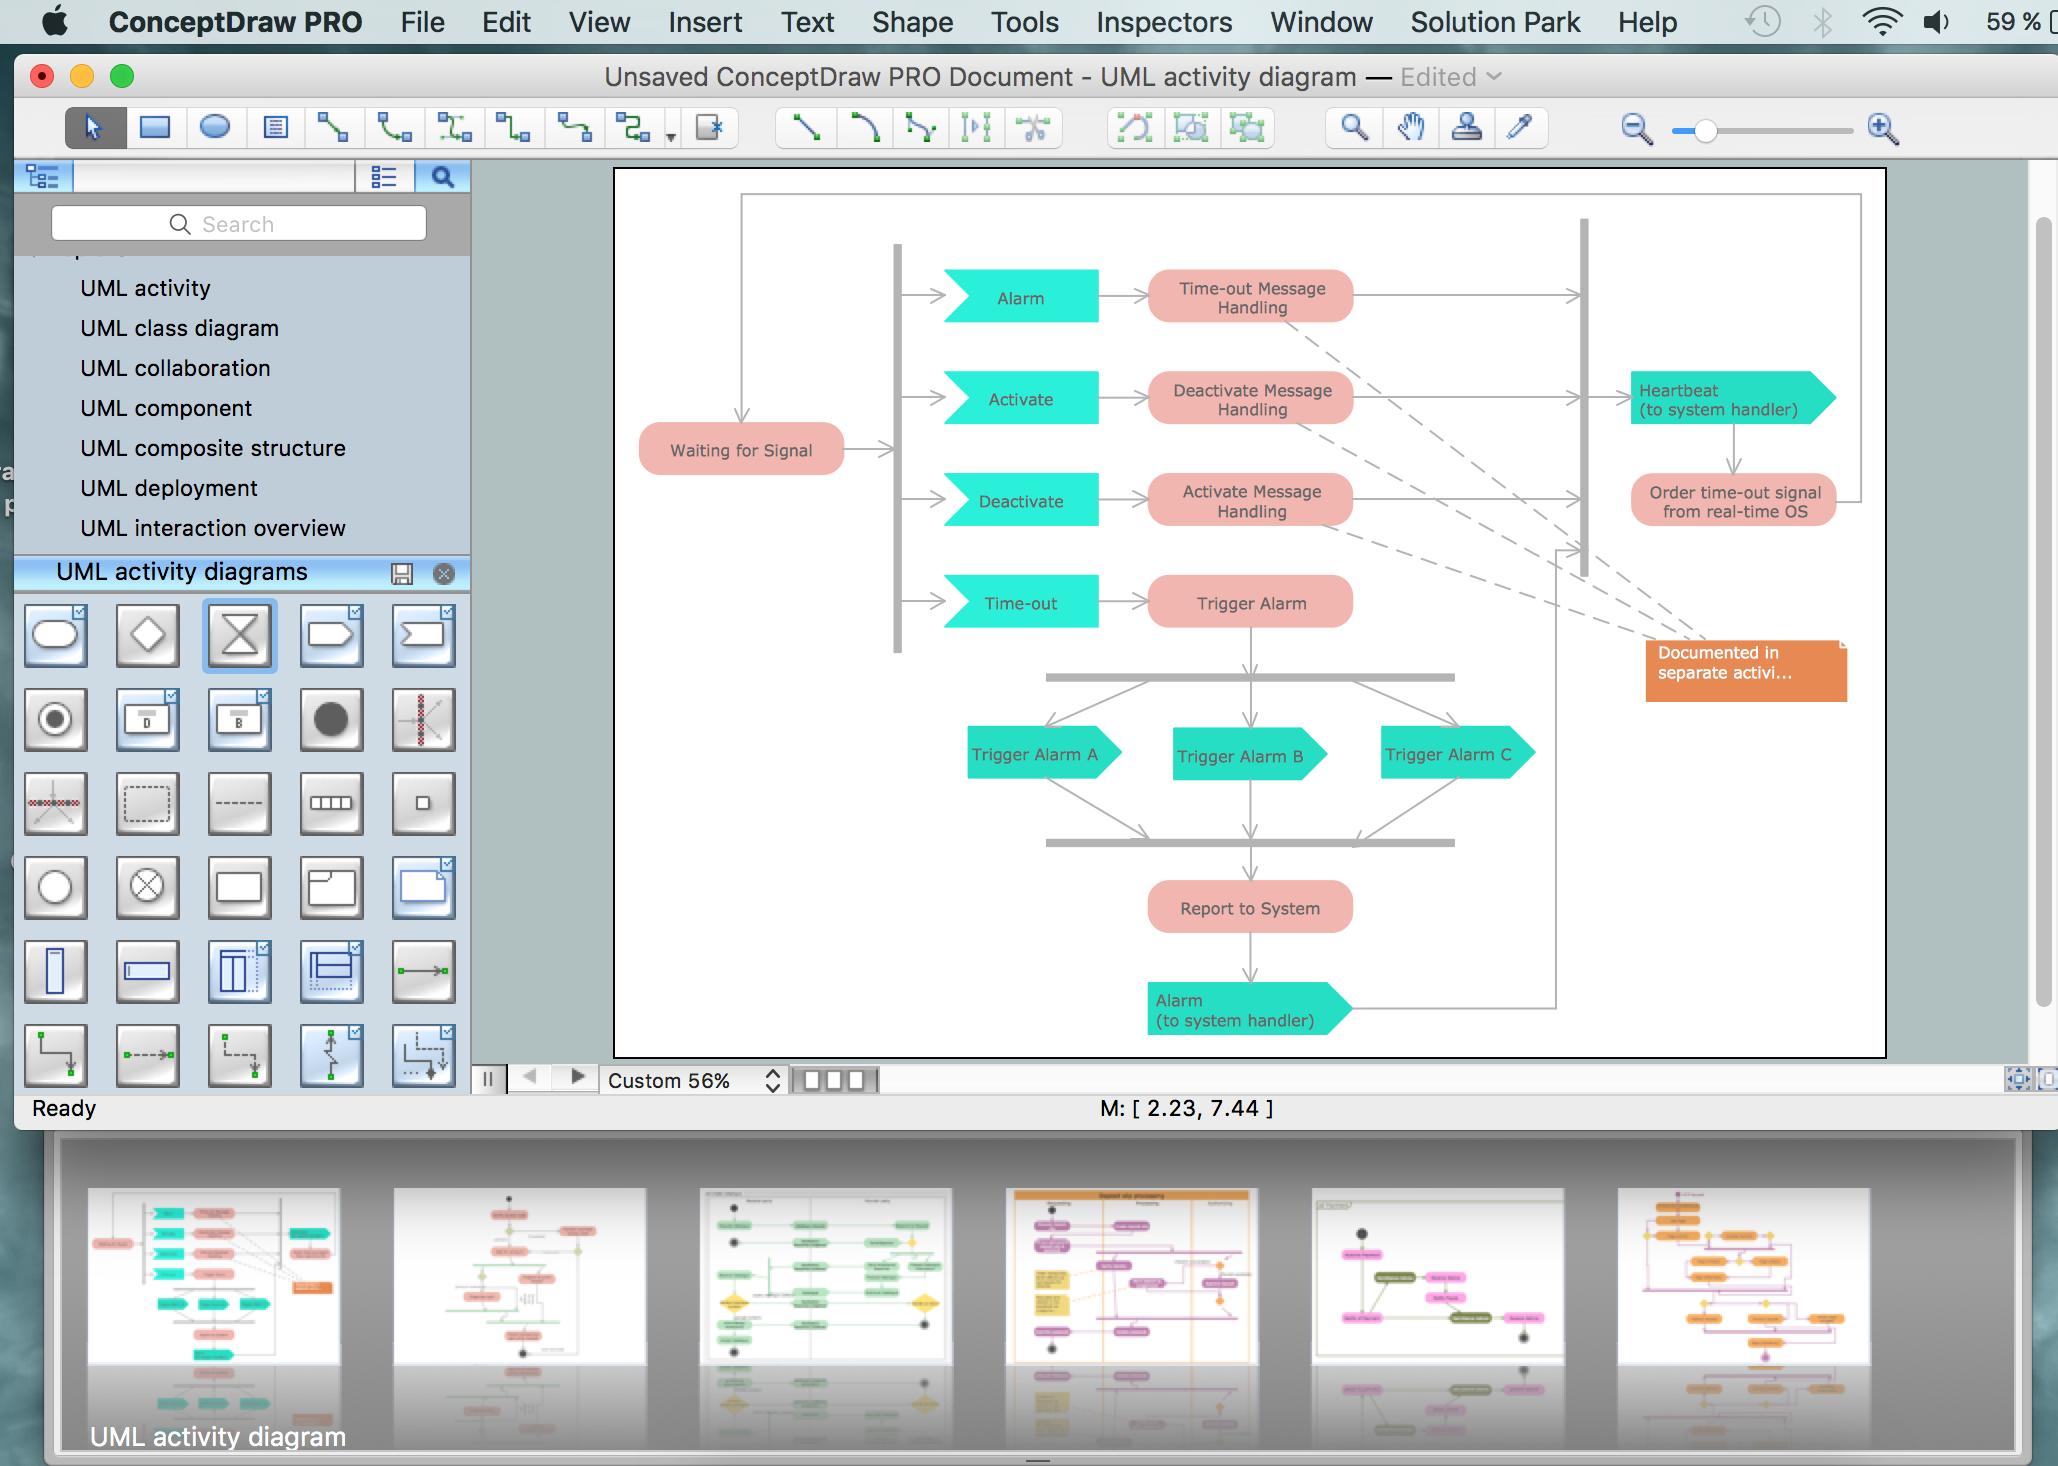 Uml Activity Diagram Design Of The Diagrams Business Graphics Block Generator Control System Elements